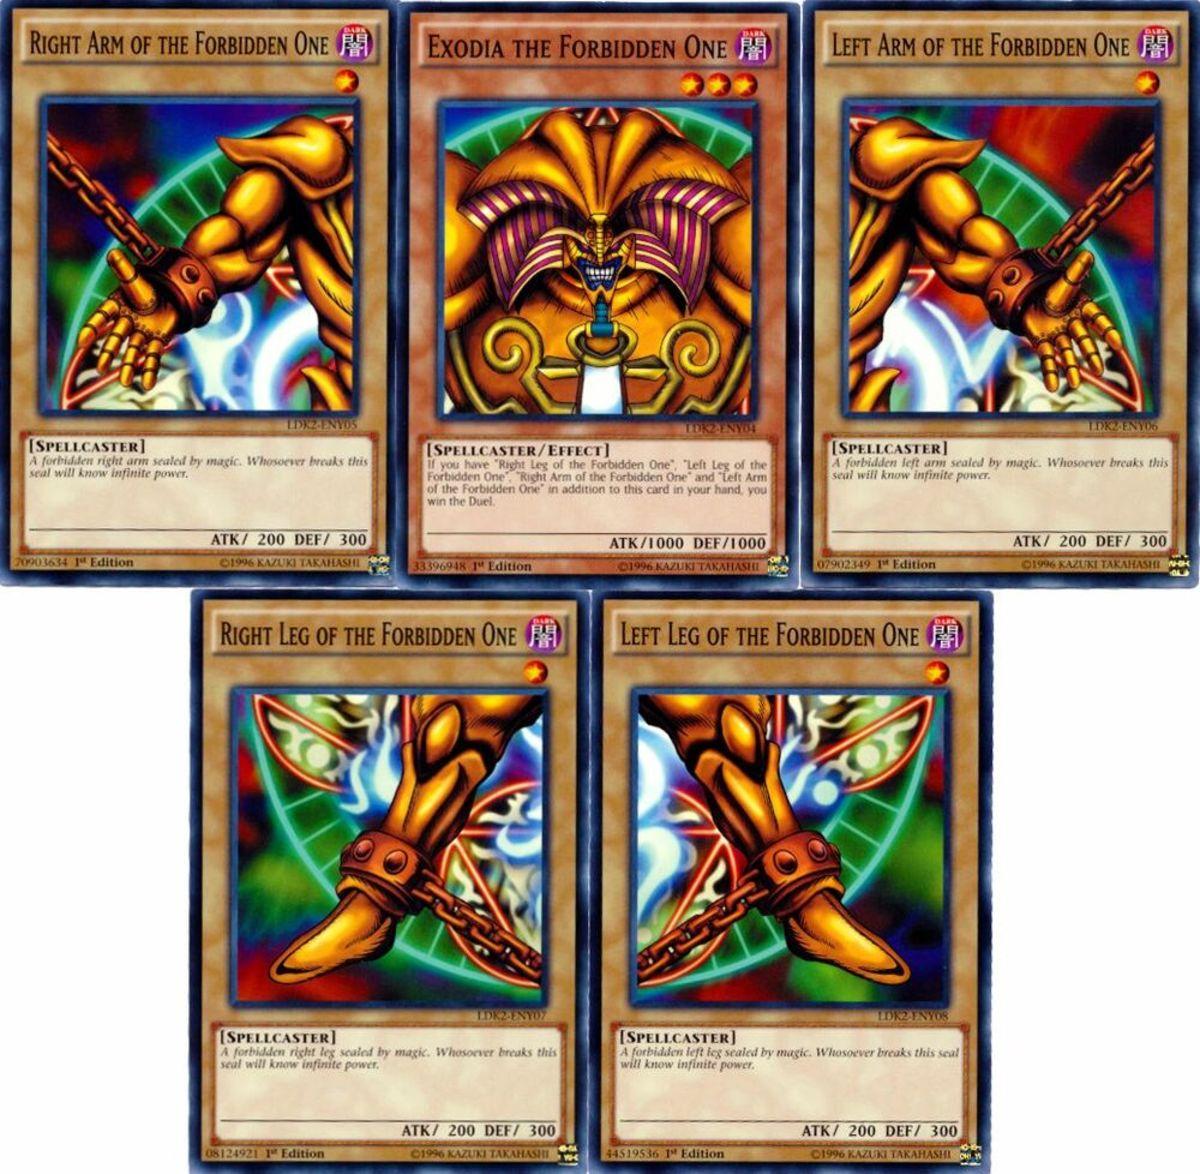 All five Exodia pieces